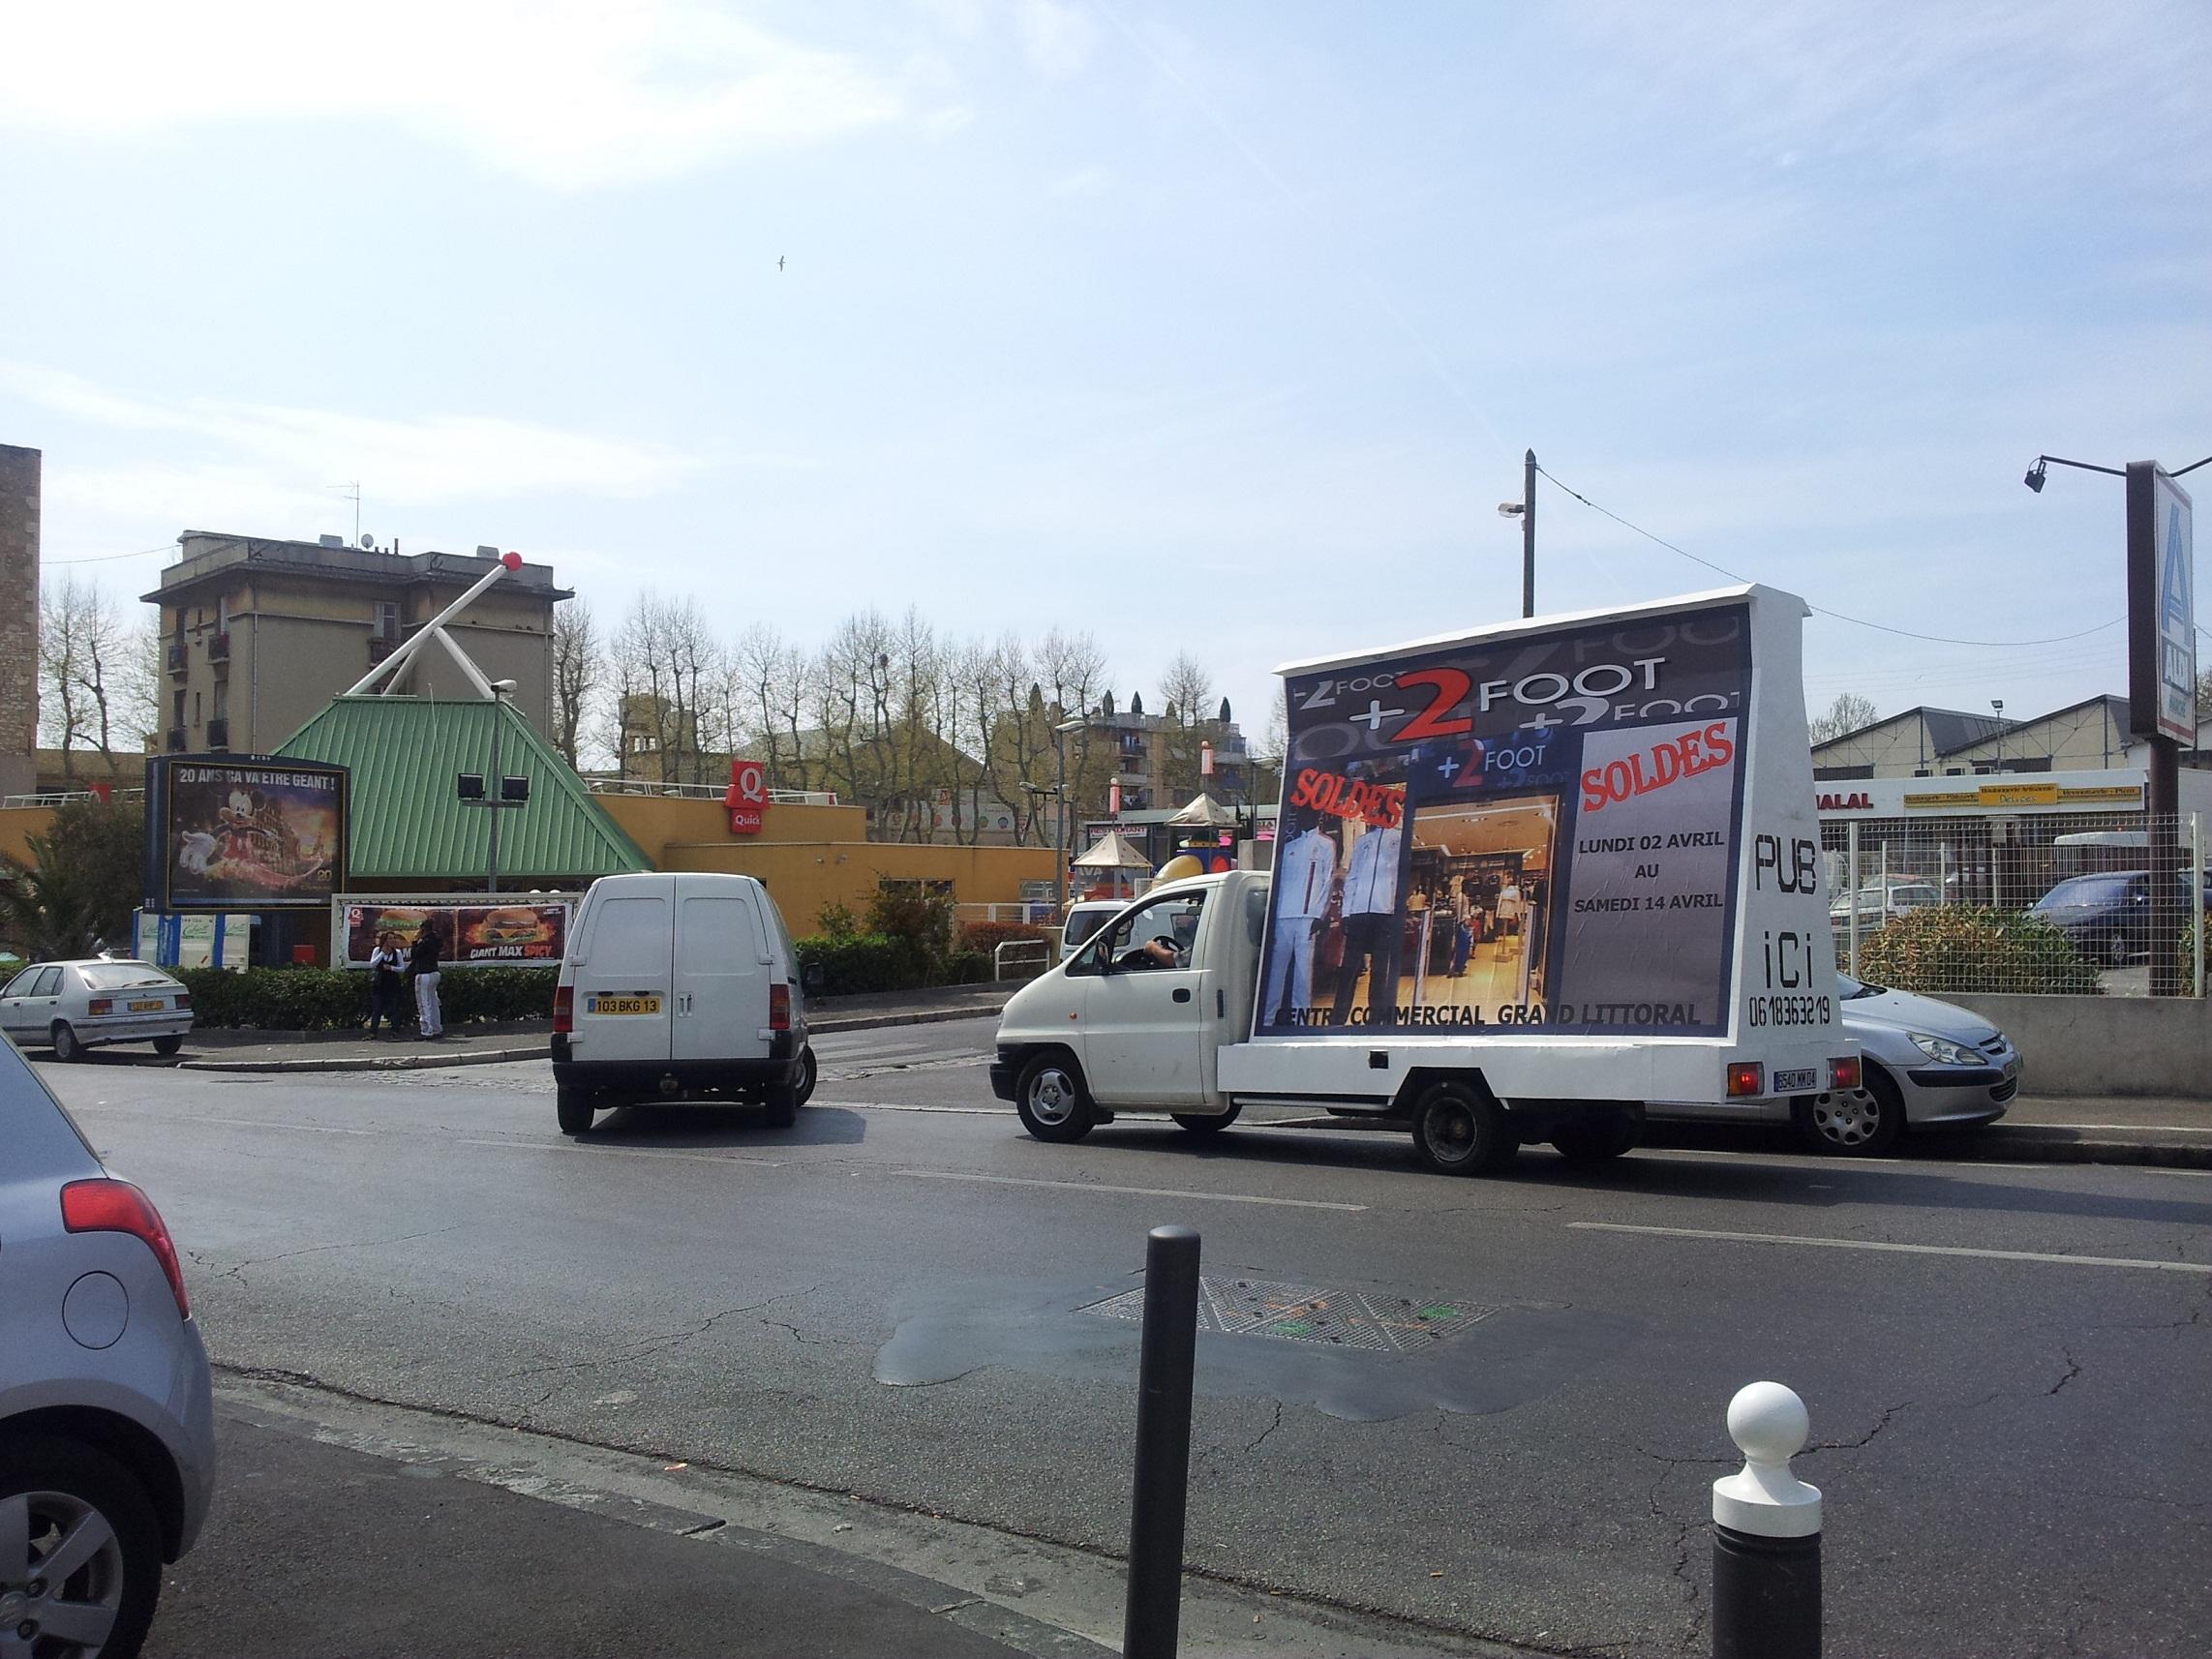 publicit urbaine nice camion publicitaire marseille street marketing. Black Bedroom Furniture Sets. Home Design Ideas